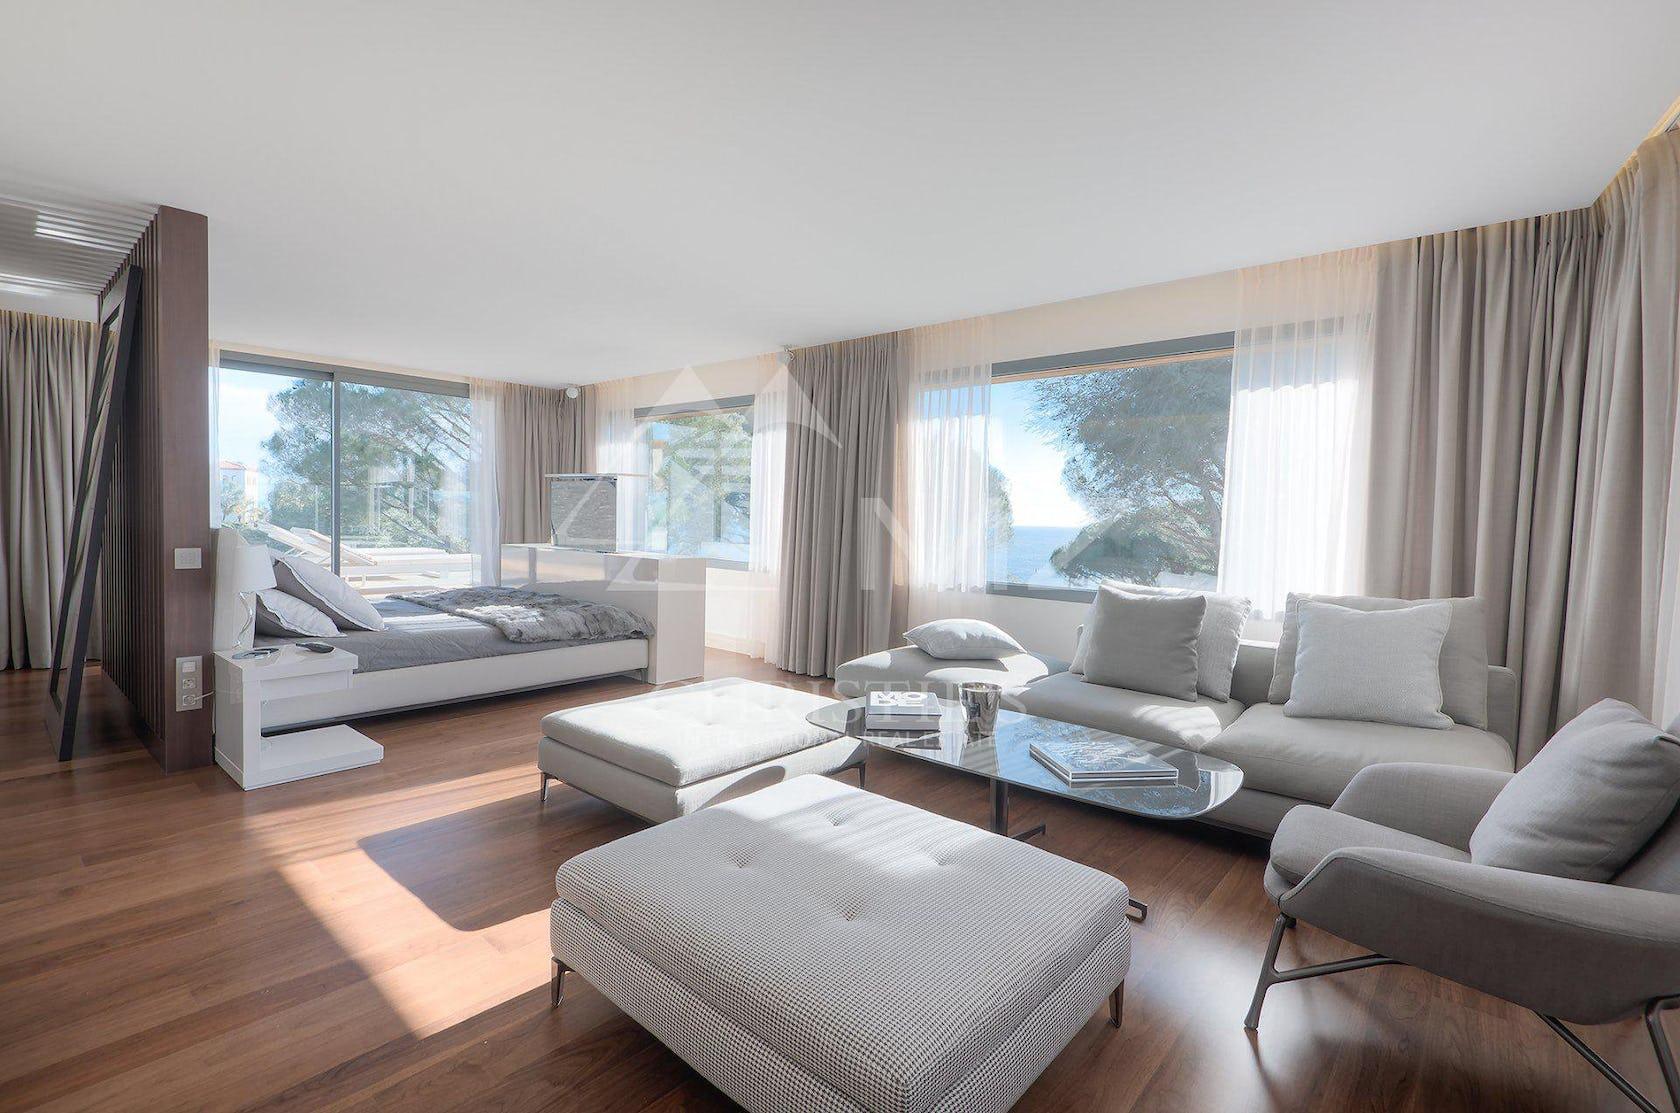 furniture living room room indoors interior design couch flooring wood table hardwood